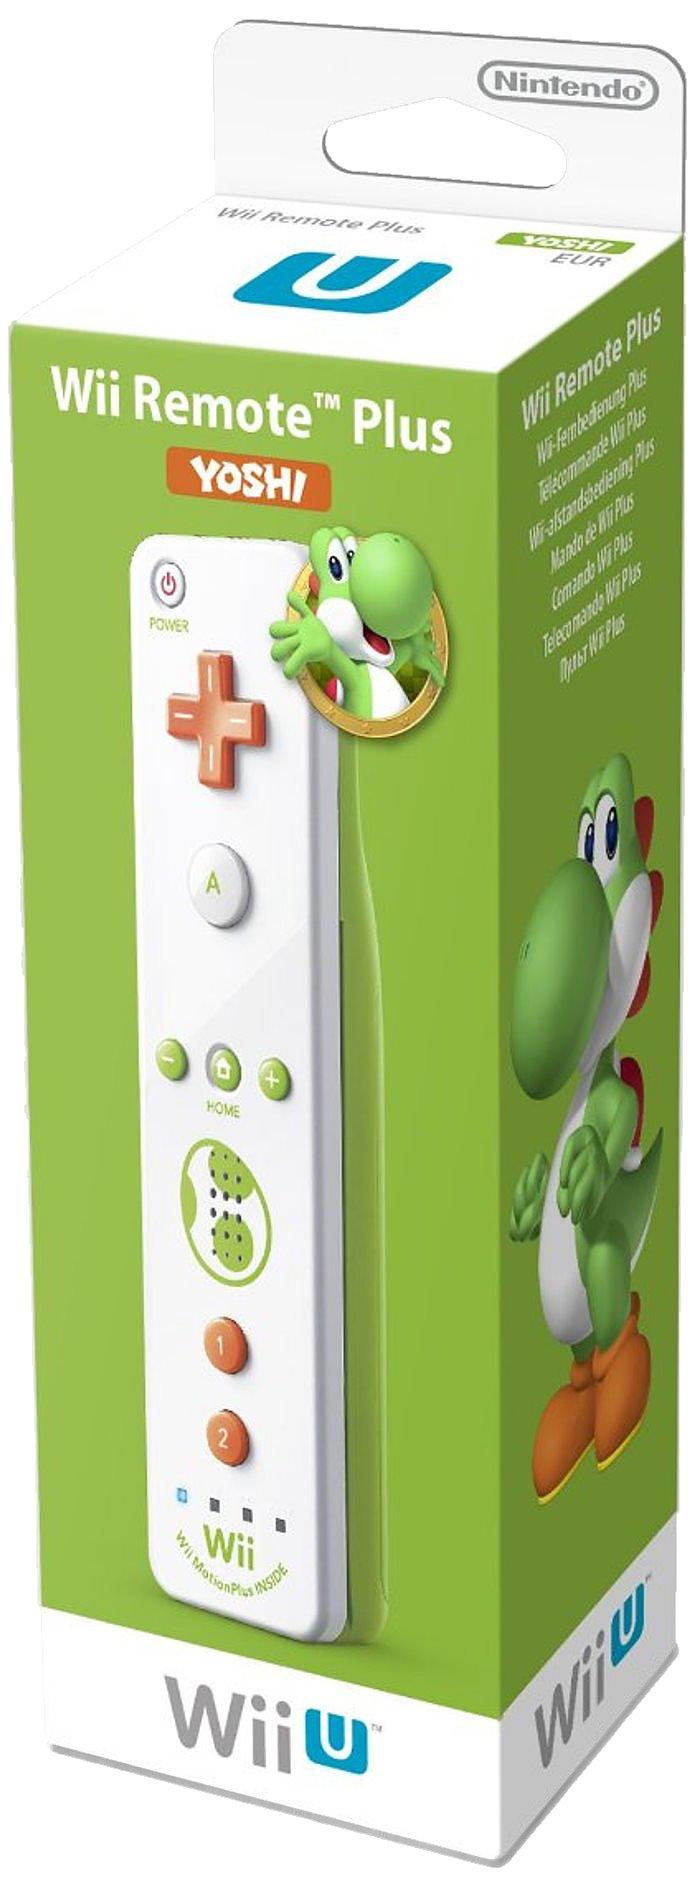 Wii U Remote Plus Yoshi's Edition, Fernbedienung für Nintendo Wii U